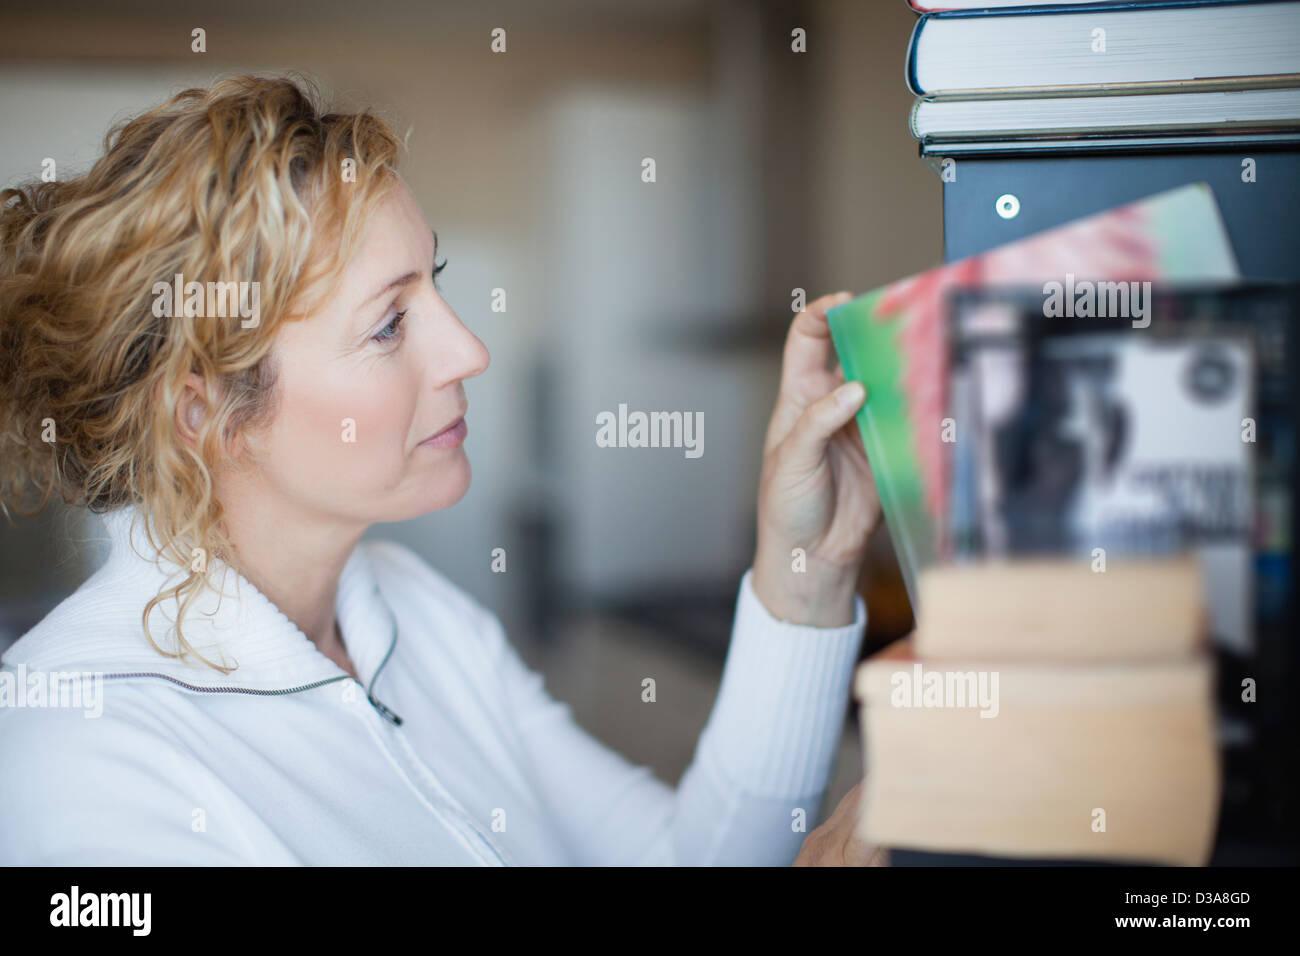 Woman organizing bookshelf - Stock Image